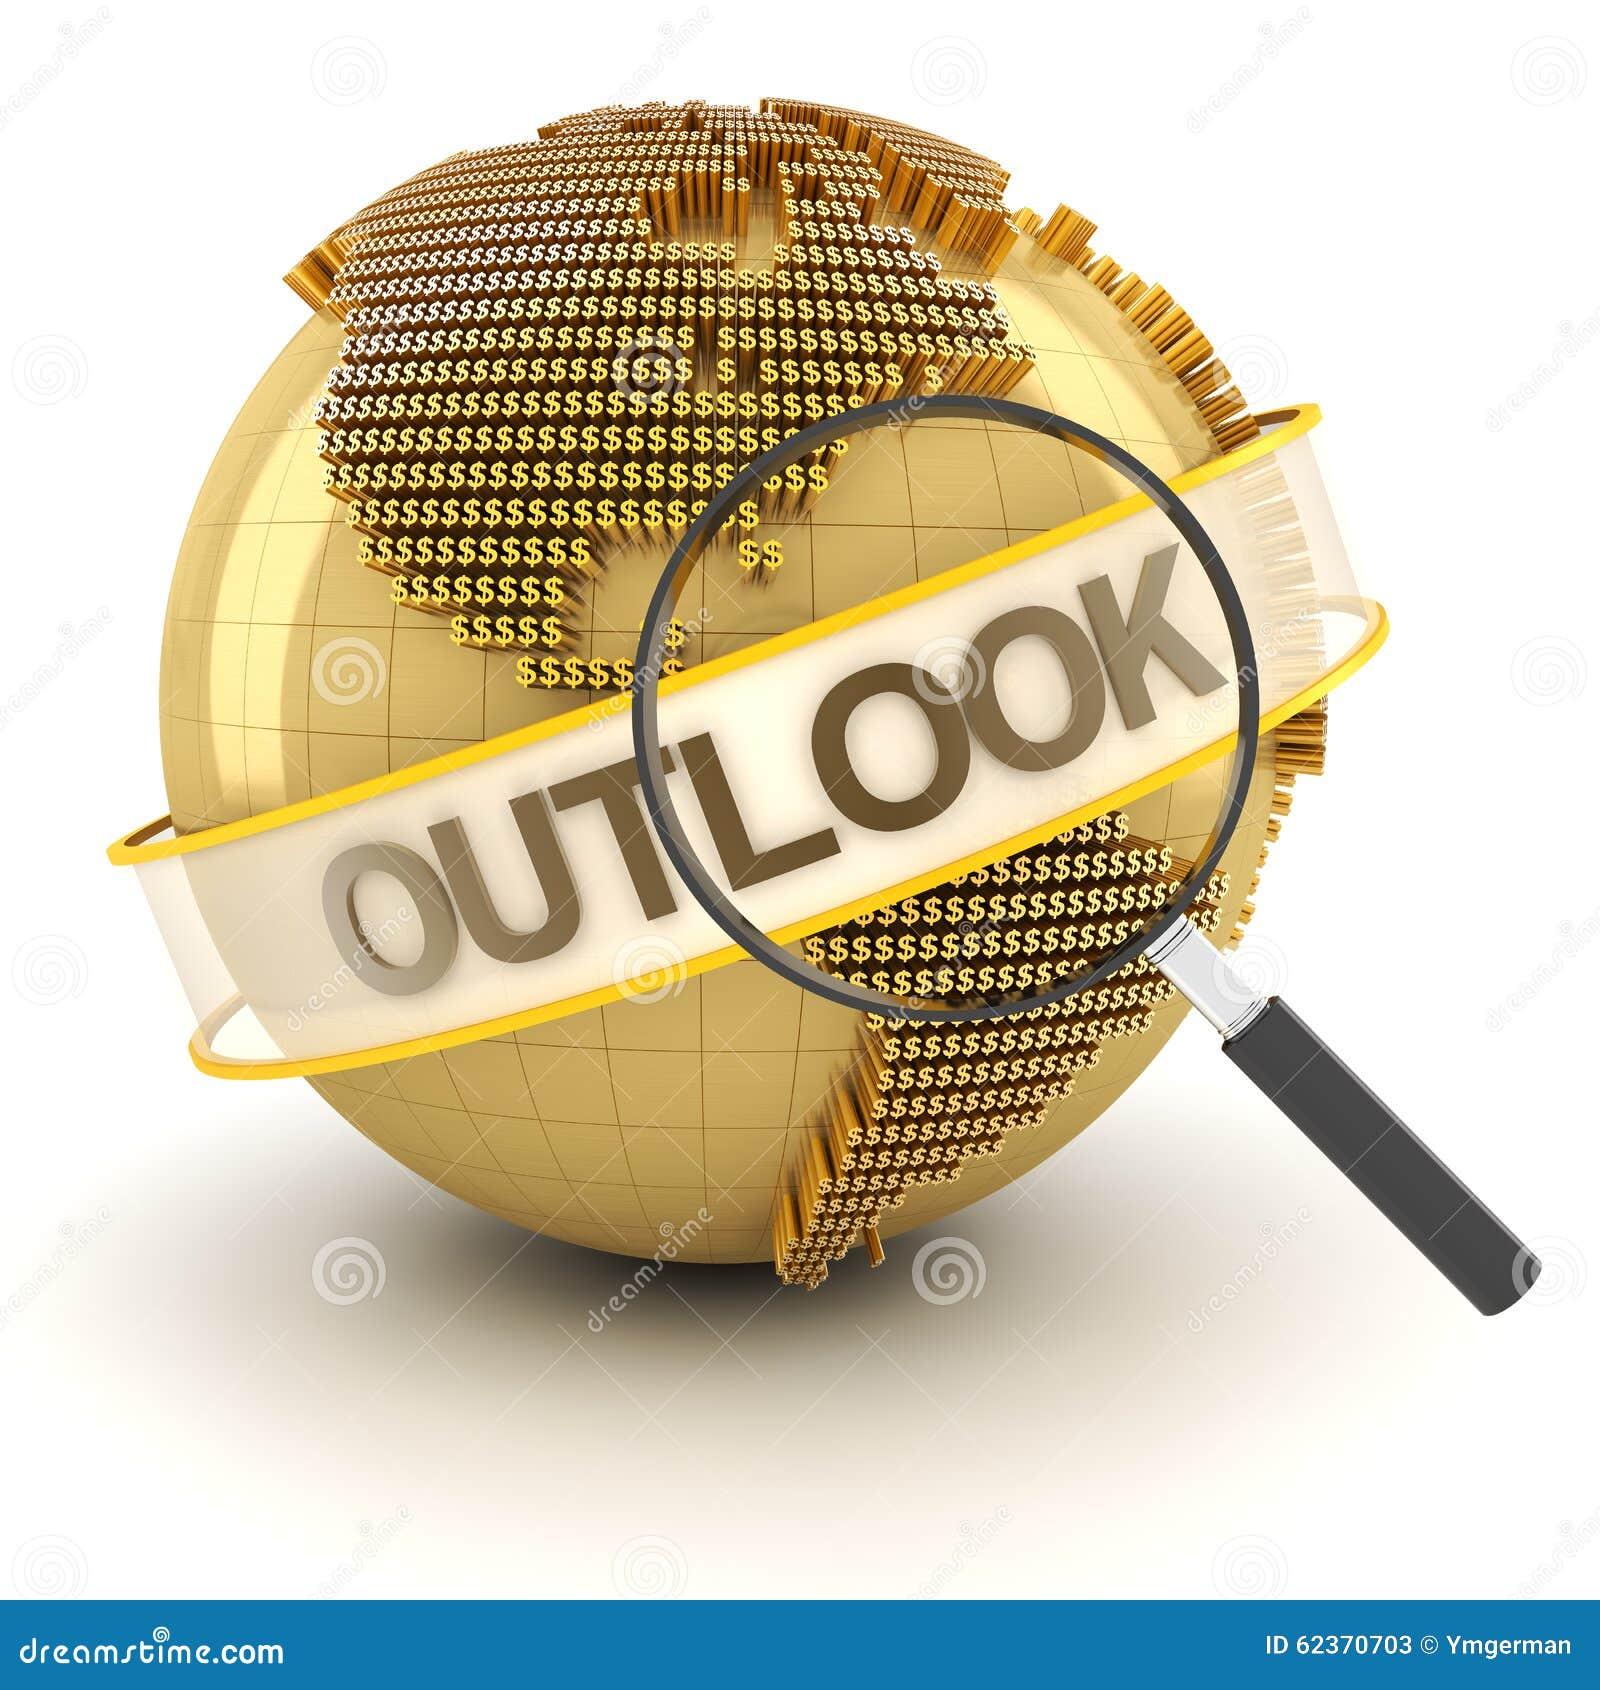 Fsa financial risk outlook and business plan